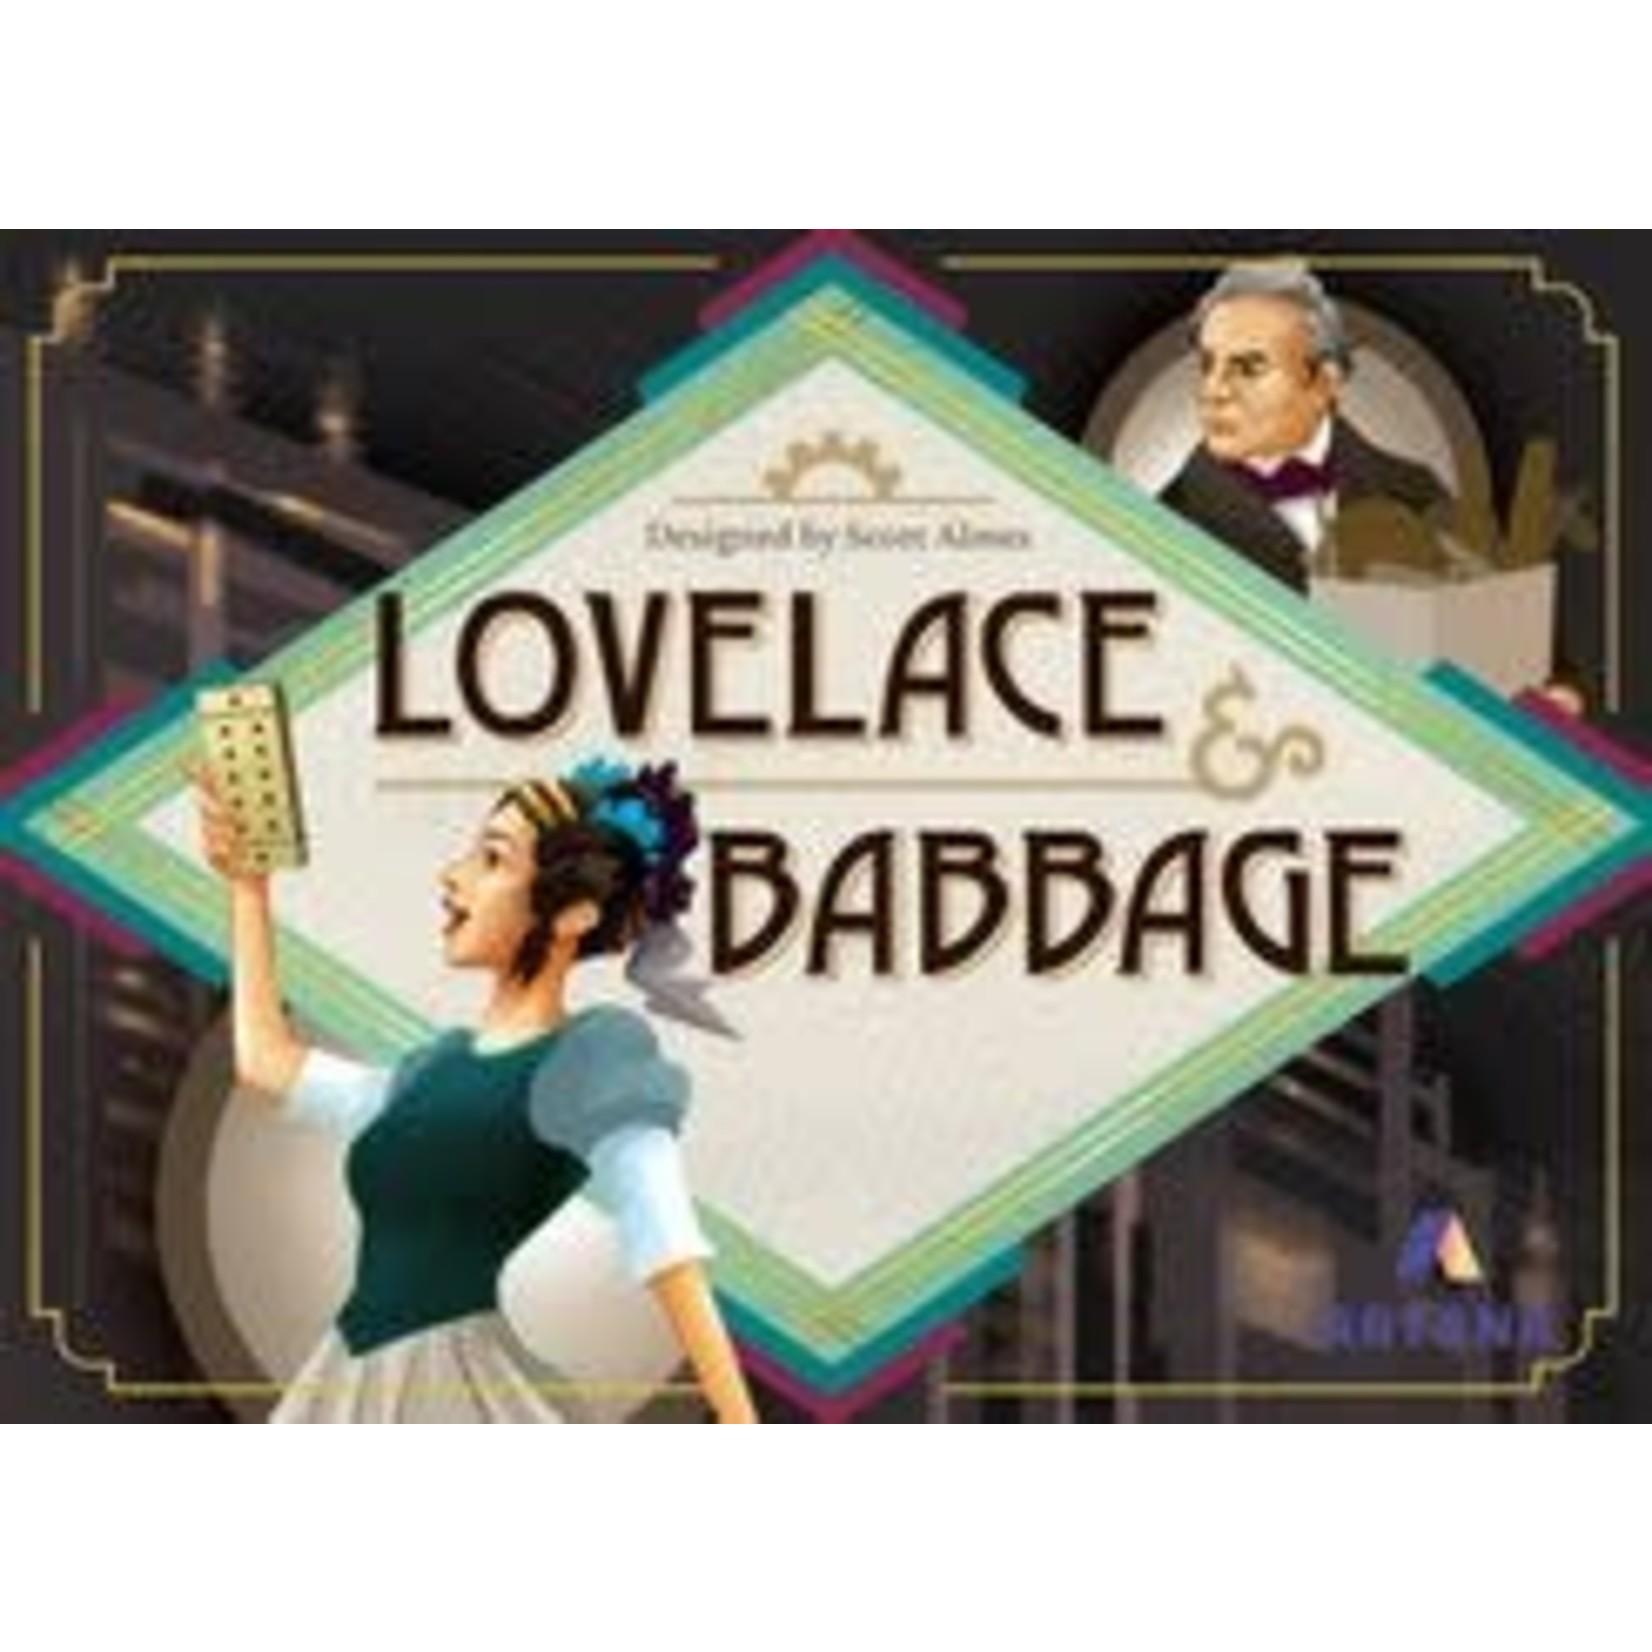 Lovelace & Babbage Board Game